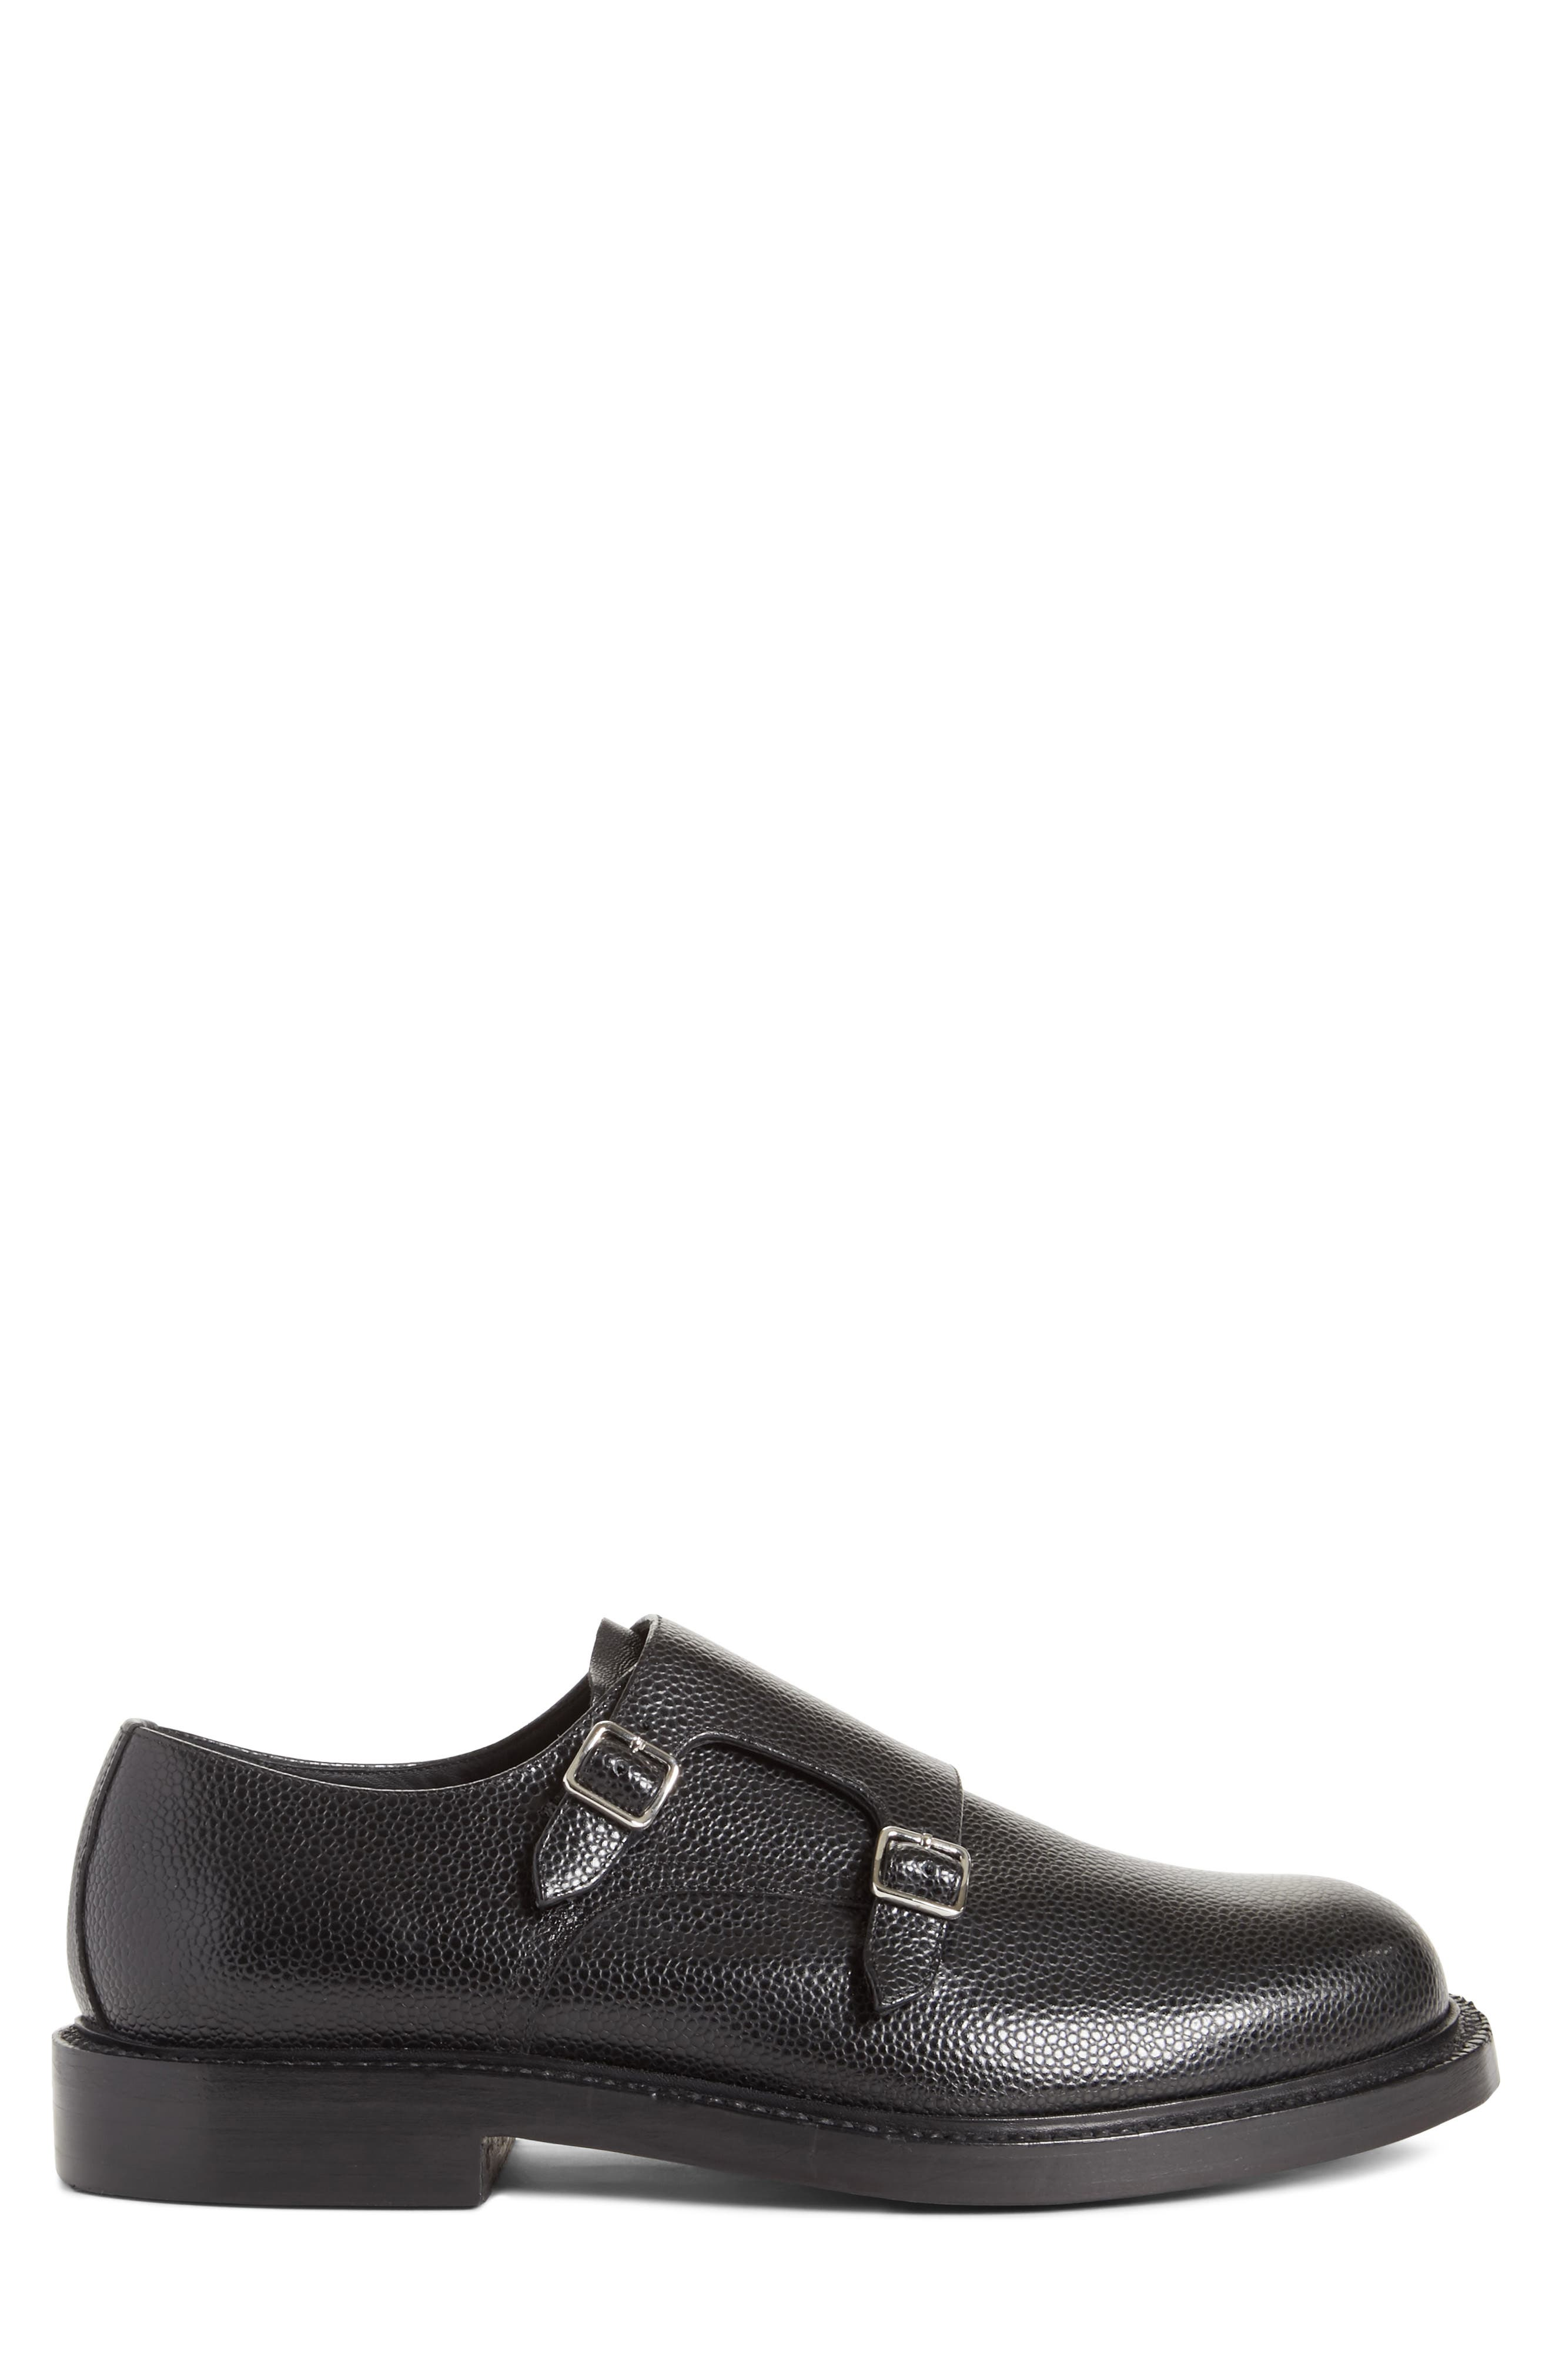 Hova Double Monk Strap Shoe,                             Alternate thumbnail 3, color,                             Black Leather